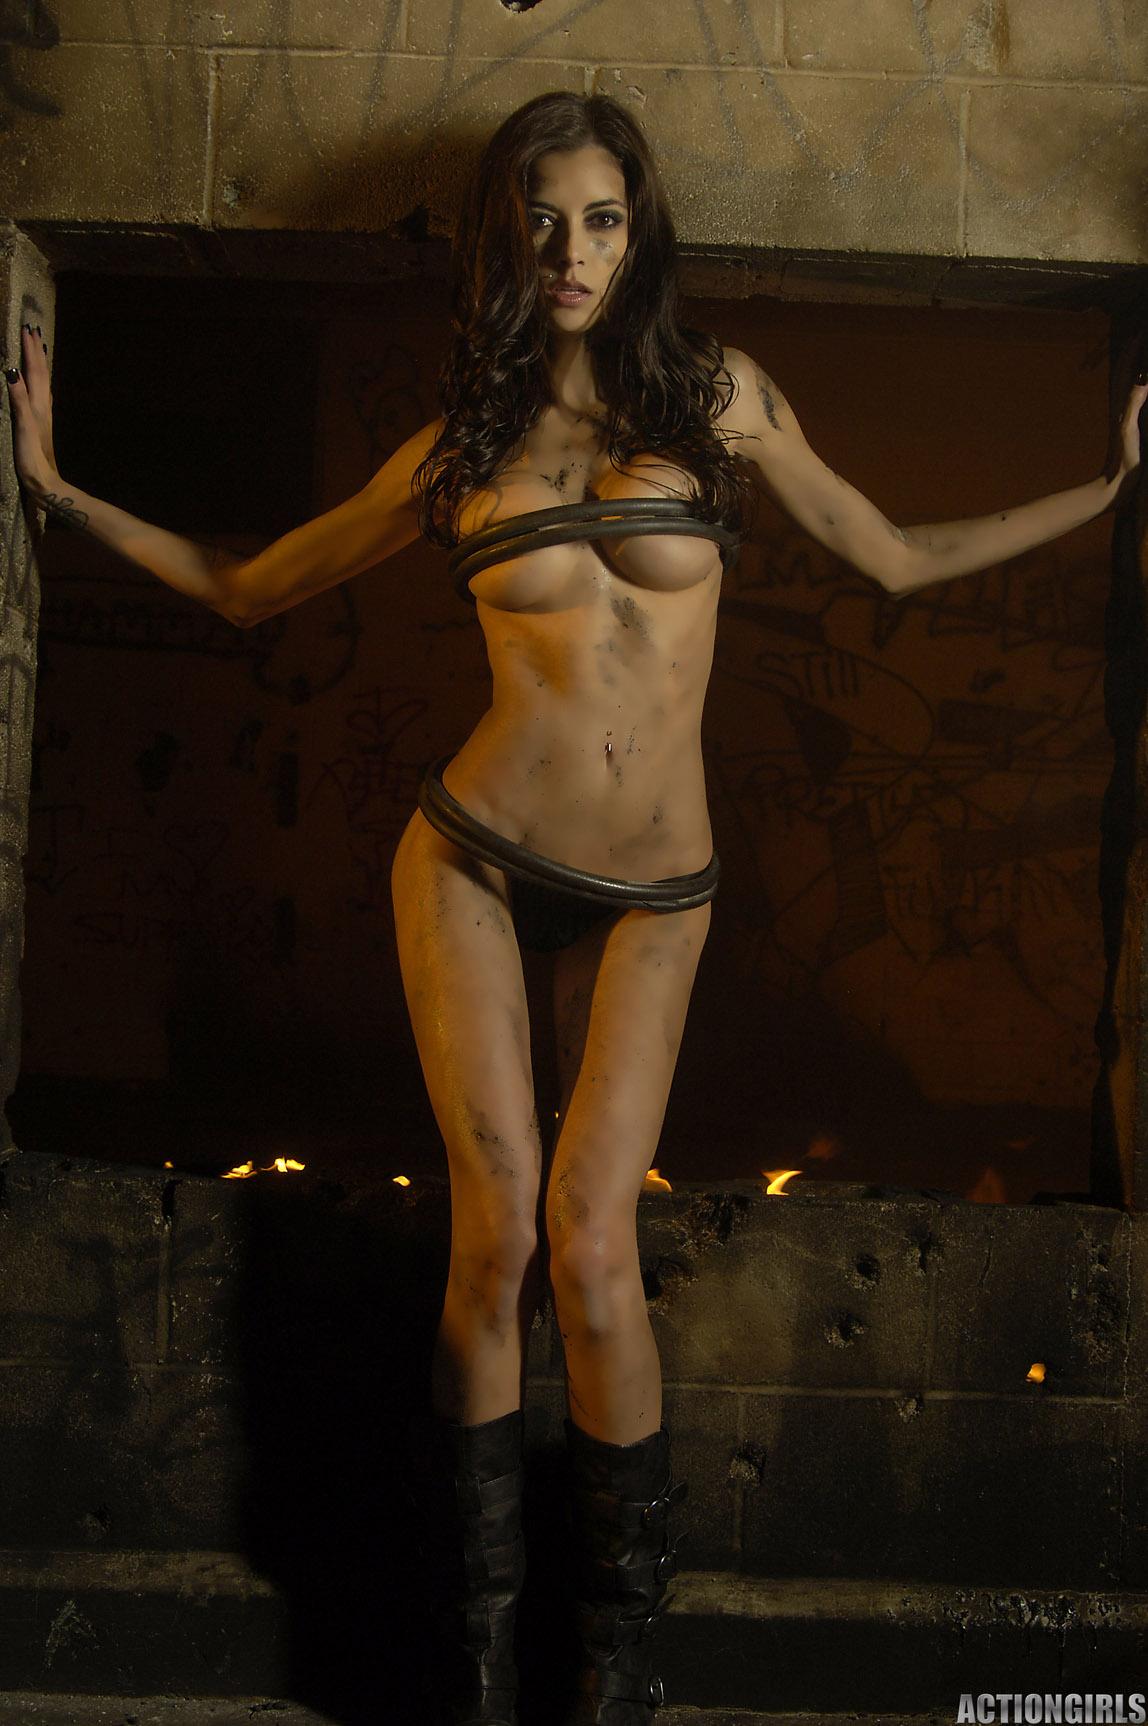 LeeAnna Vamp  nackt